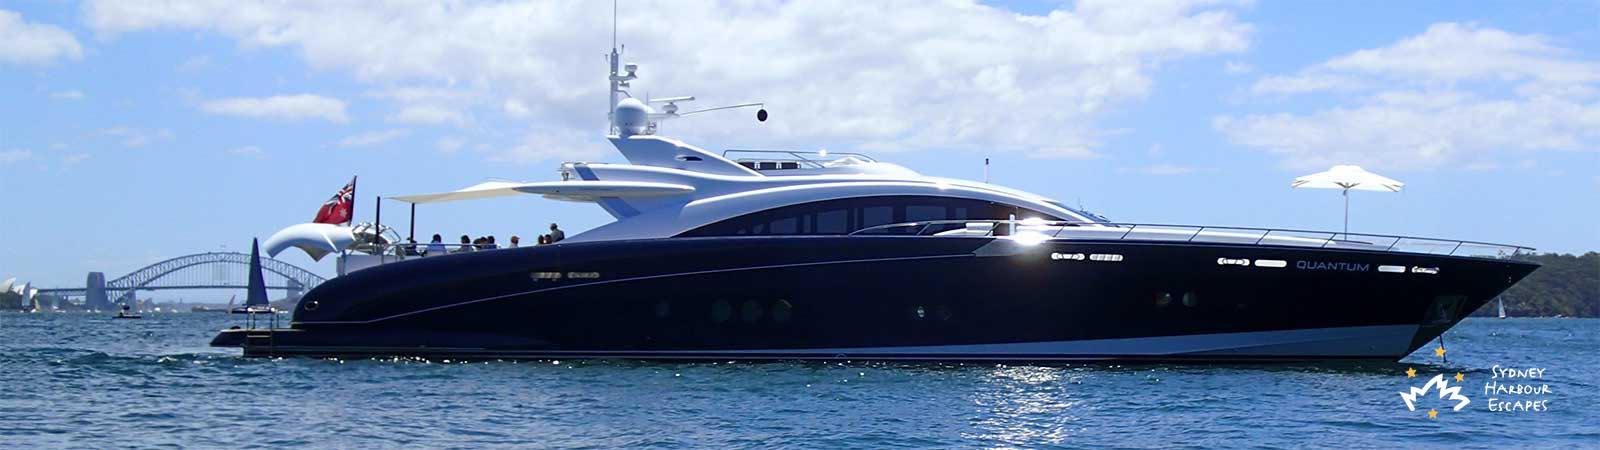 Quantum Boat Hire Luxury Superyacht Charter Sydney Harbour